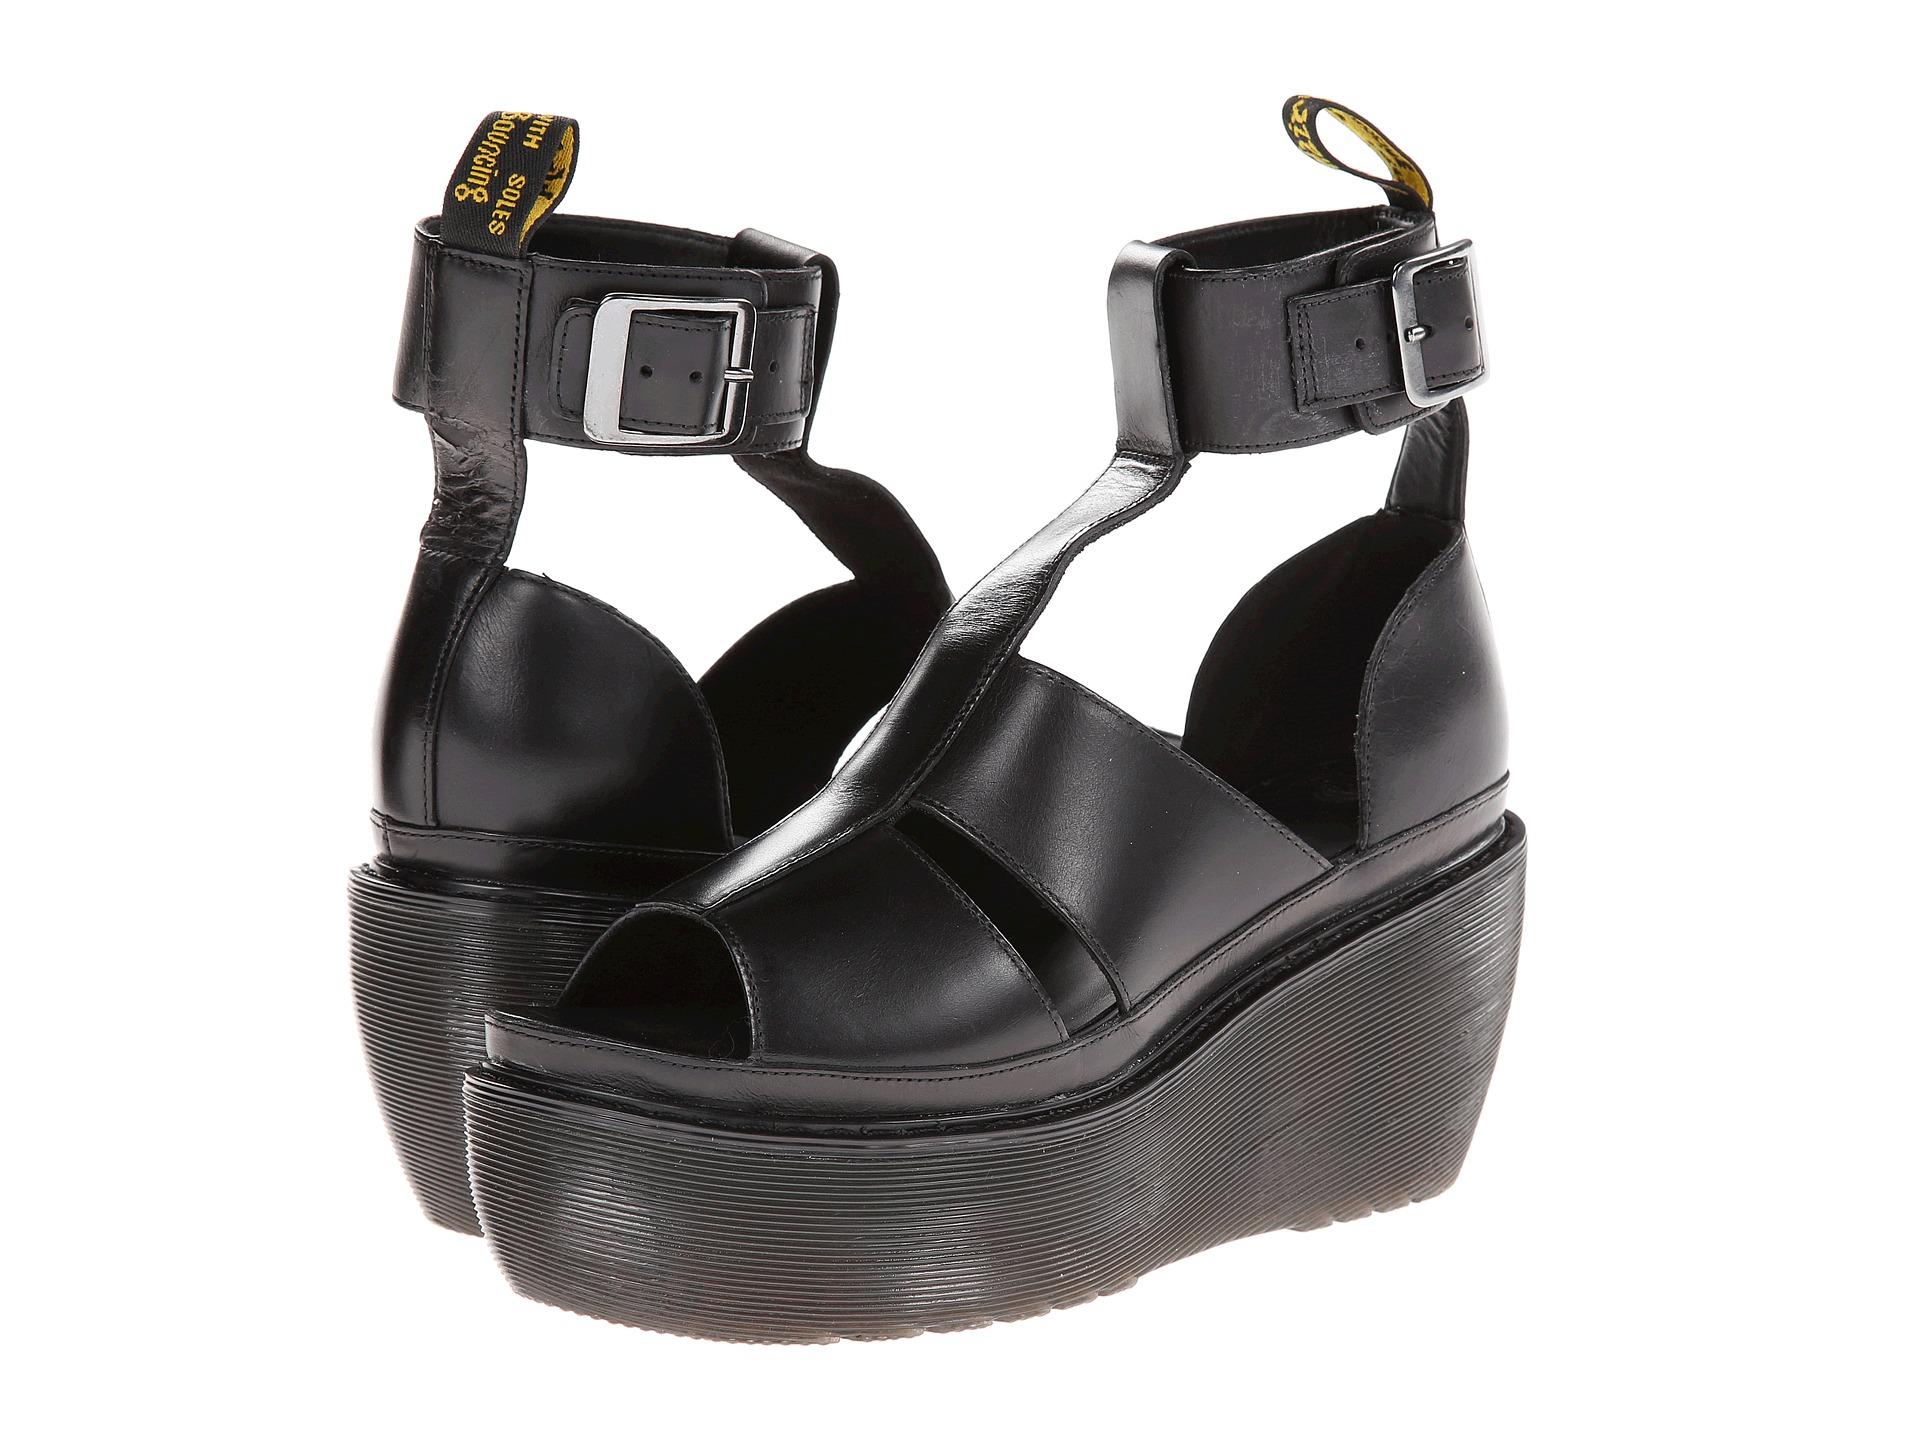 215760fa Dr. Martens Bessie Ankle Strap Sandal in Black - Lyst